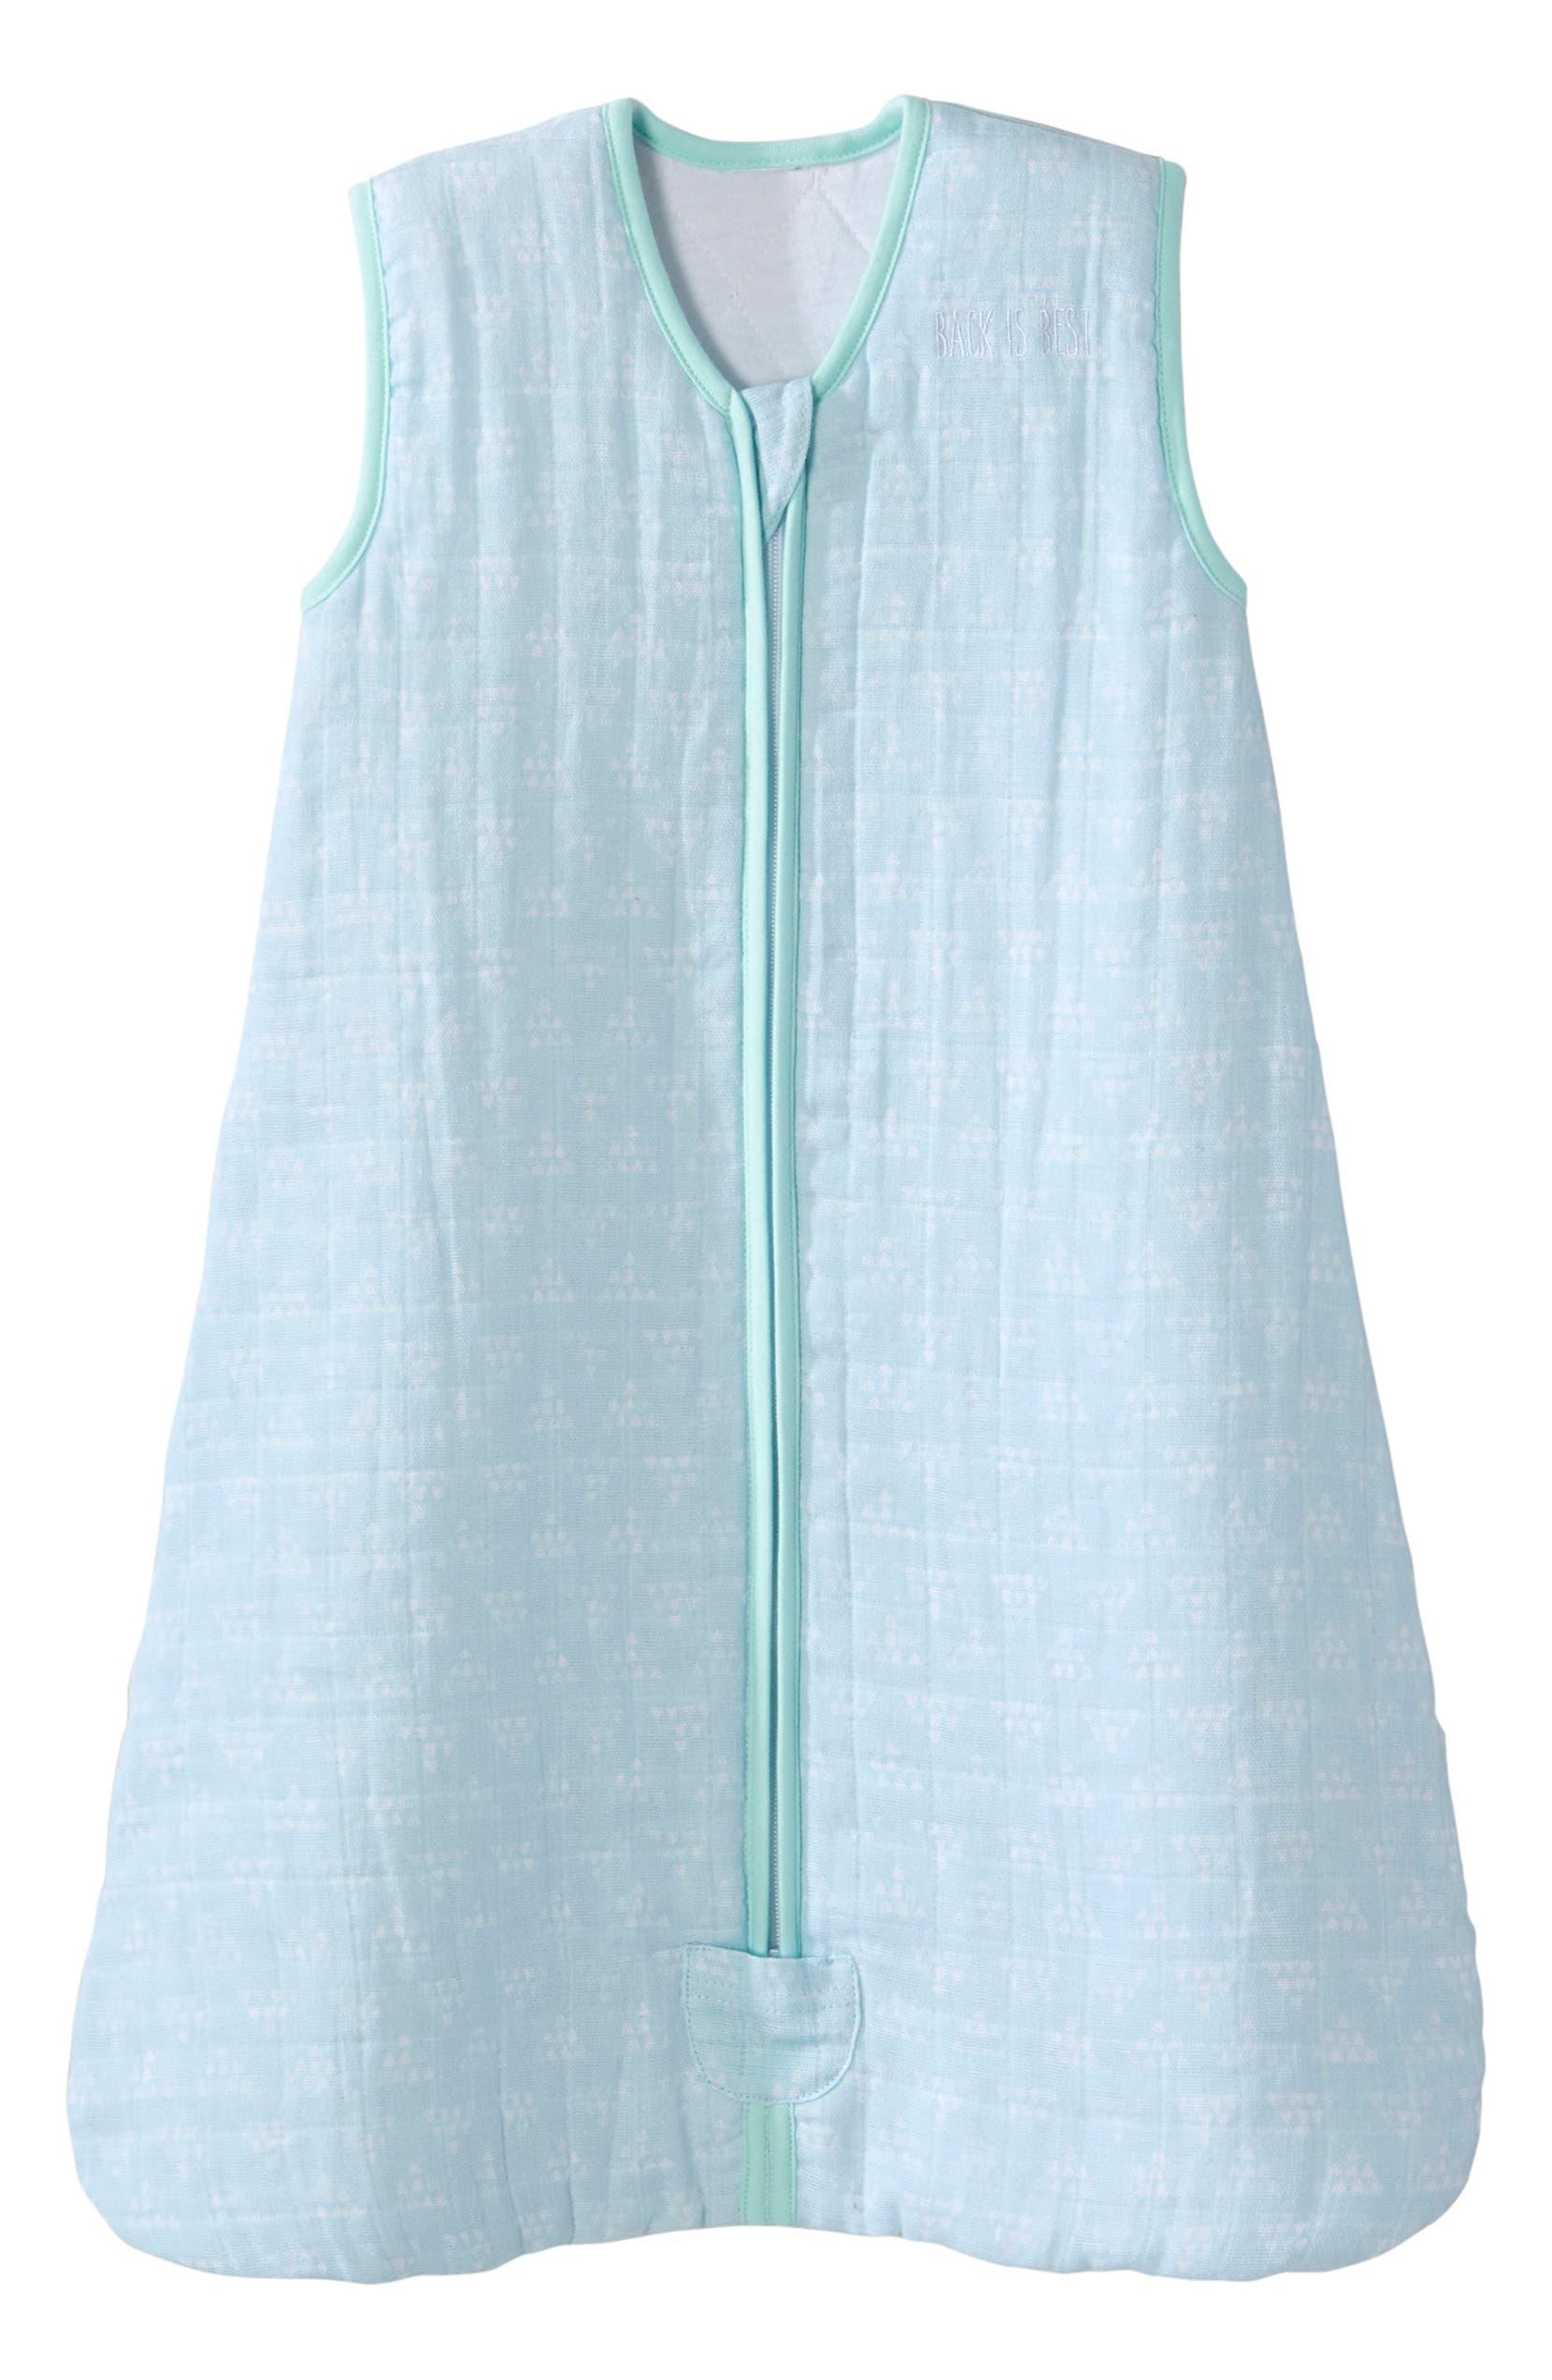 1bce0090cb Halo® Platinum Series SleepSack™ Quilted Muslin Wearable Blanket (Baby)